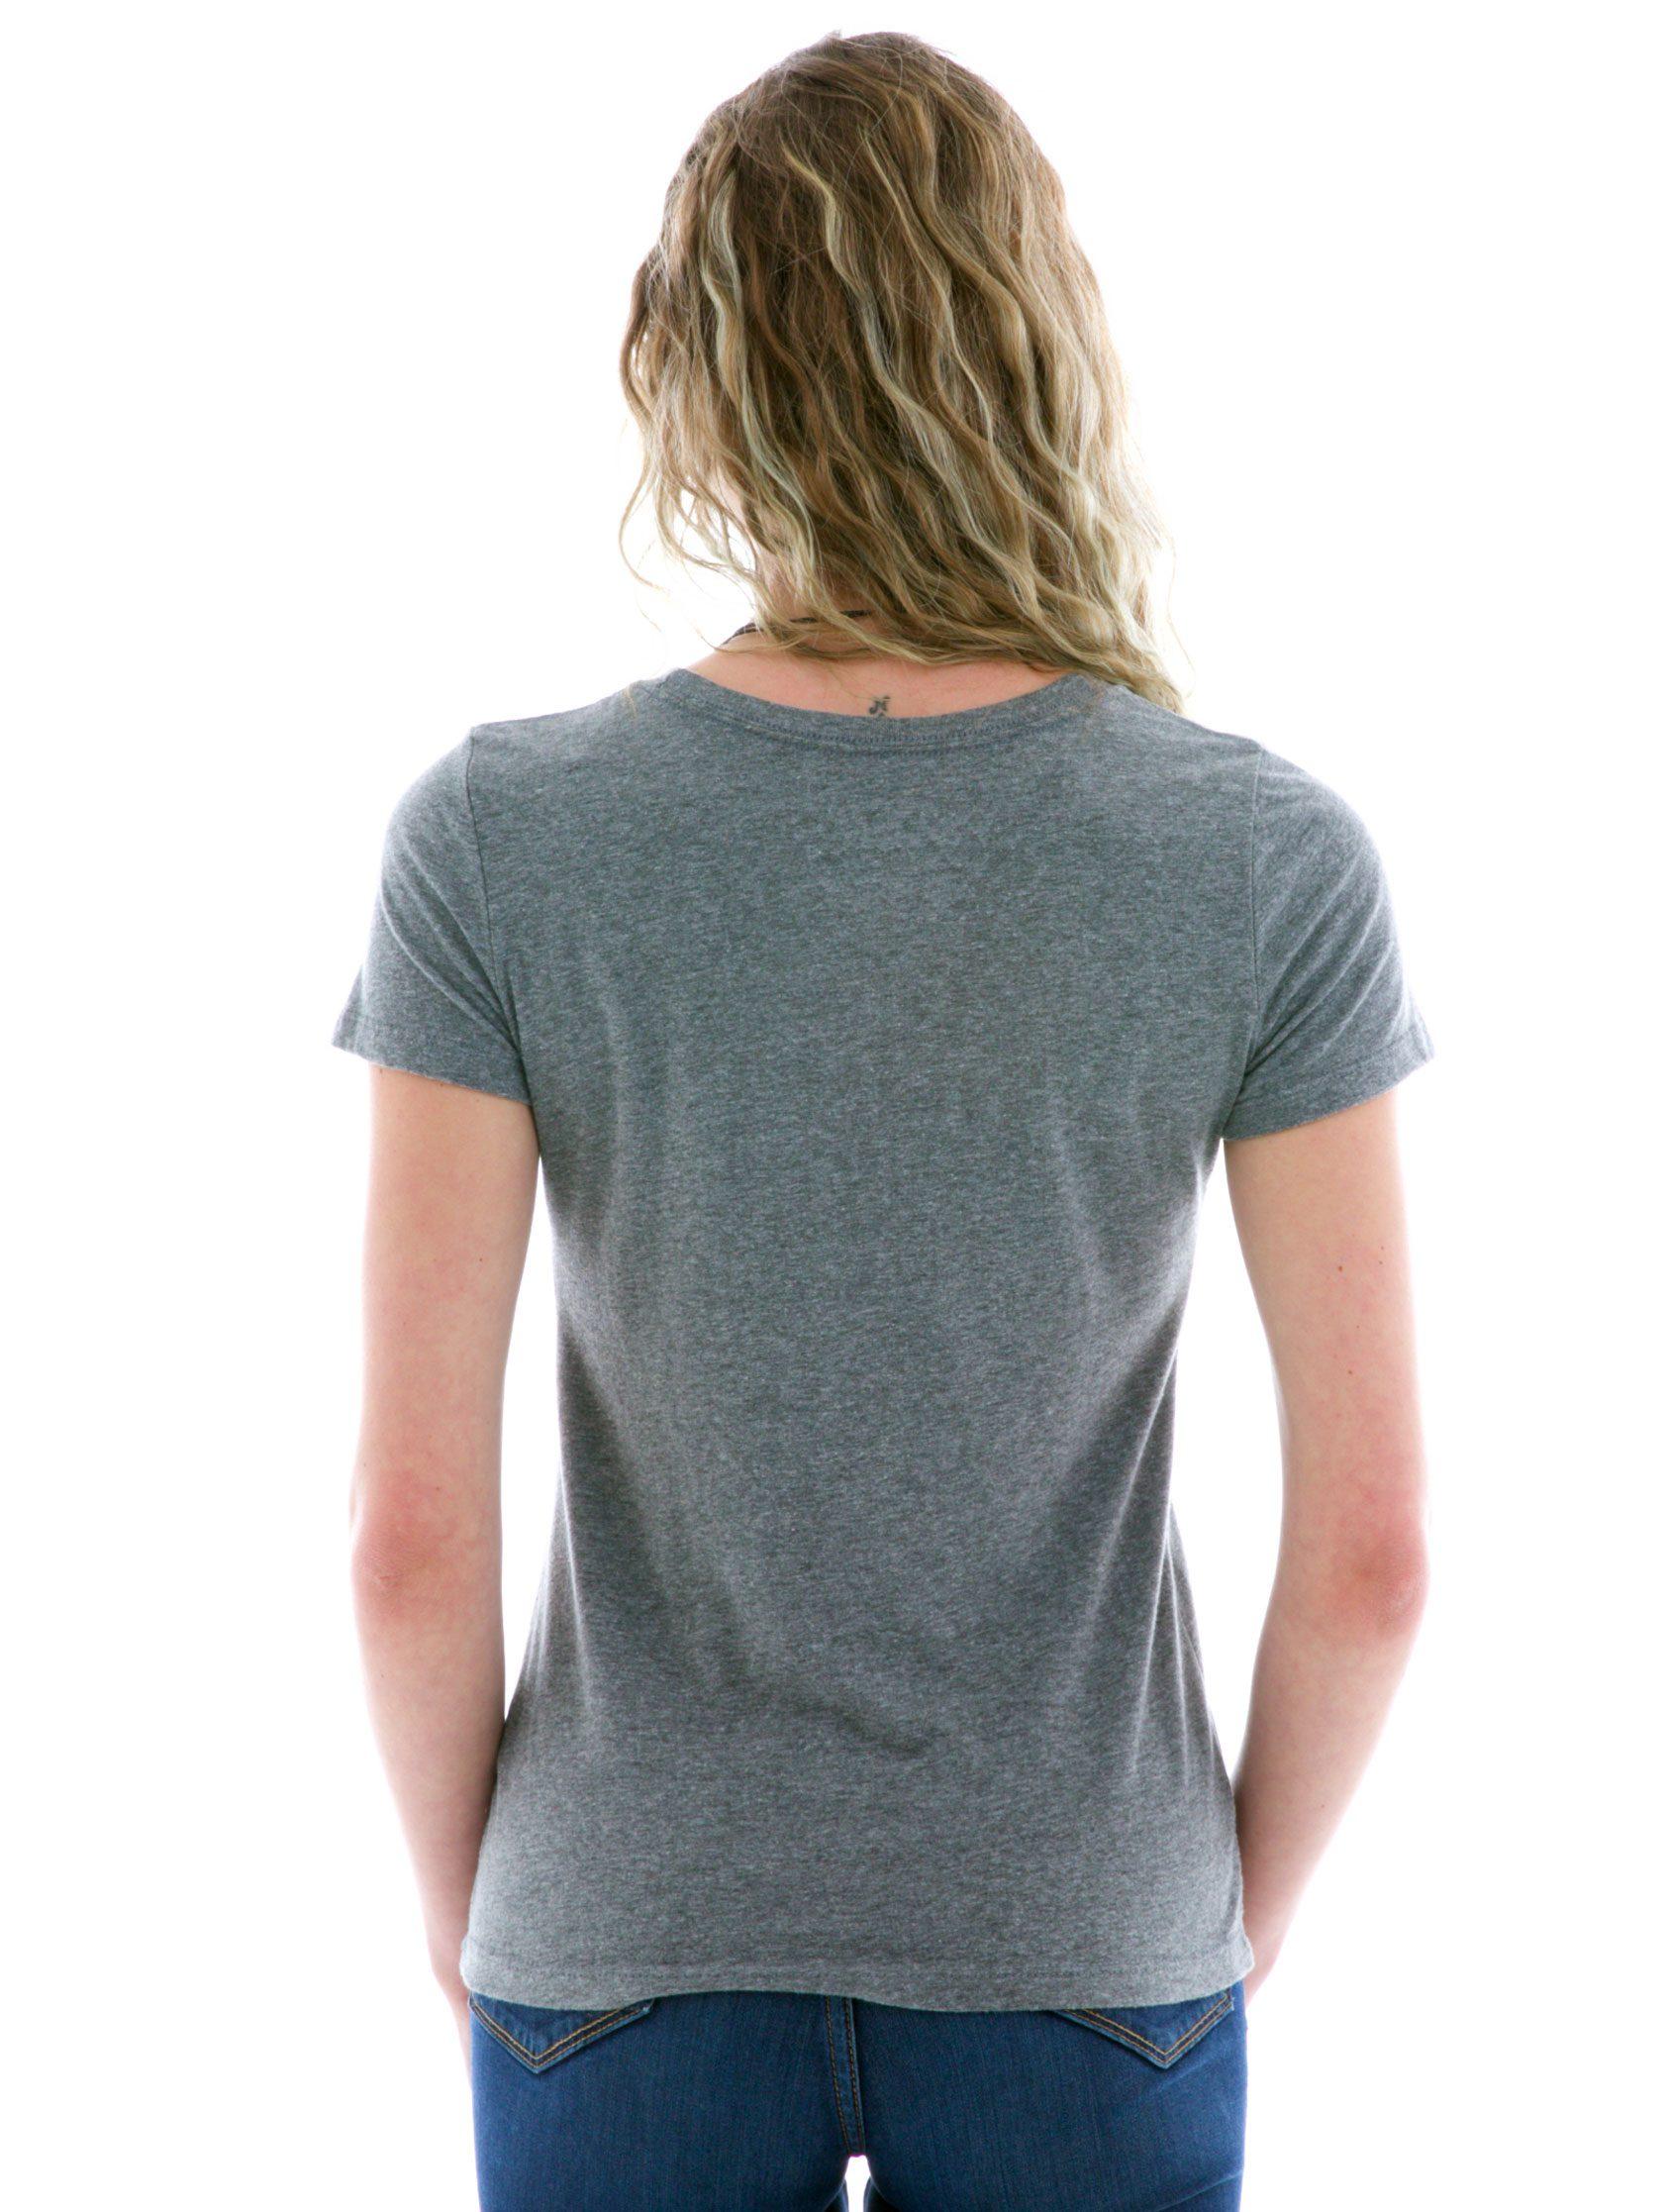 Luscious Triblend Crew Short Sleeve T-Shirt Back View